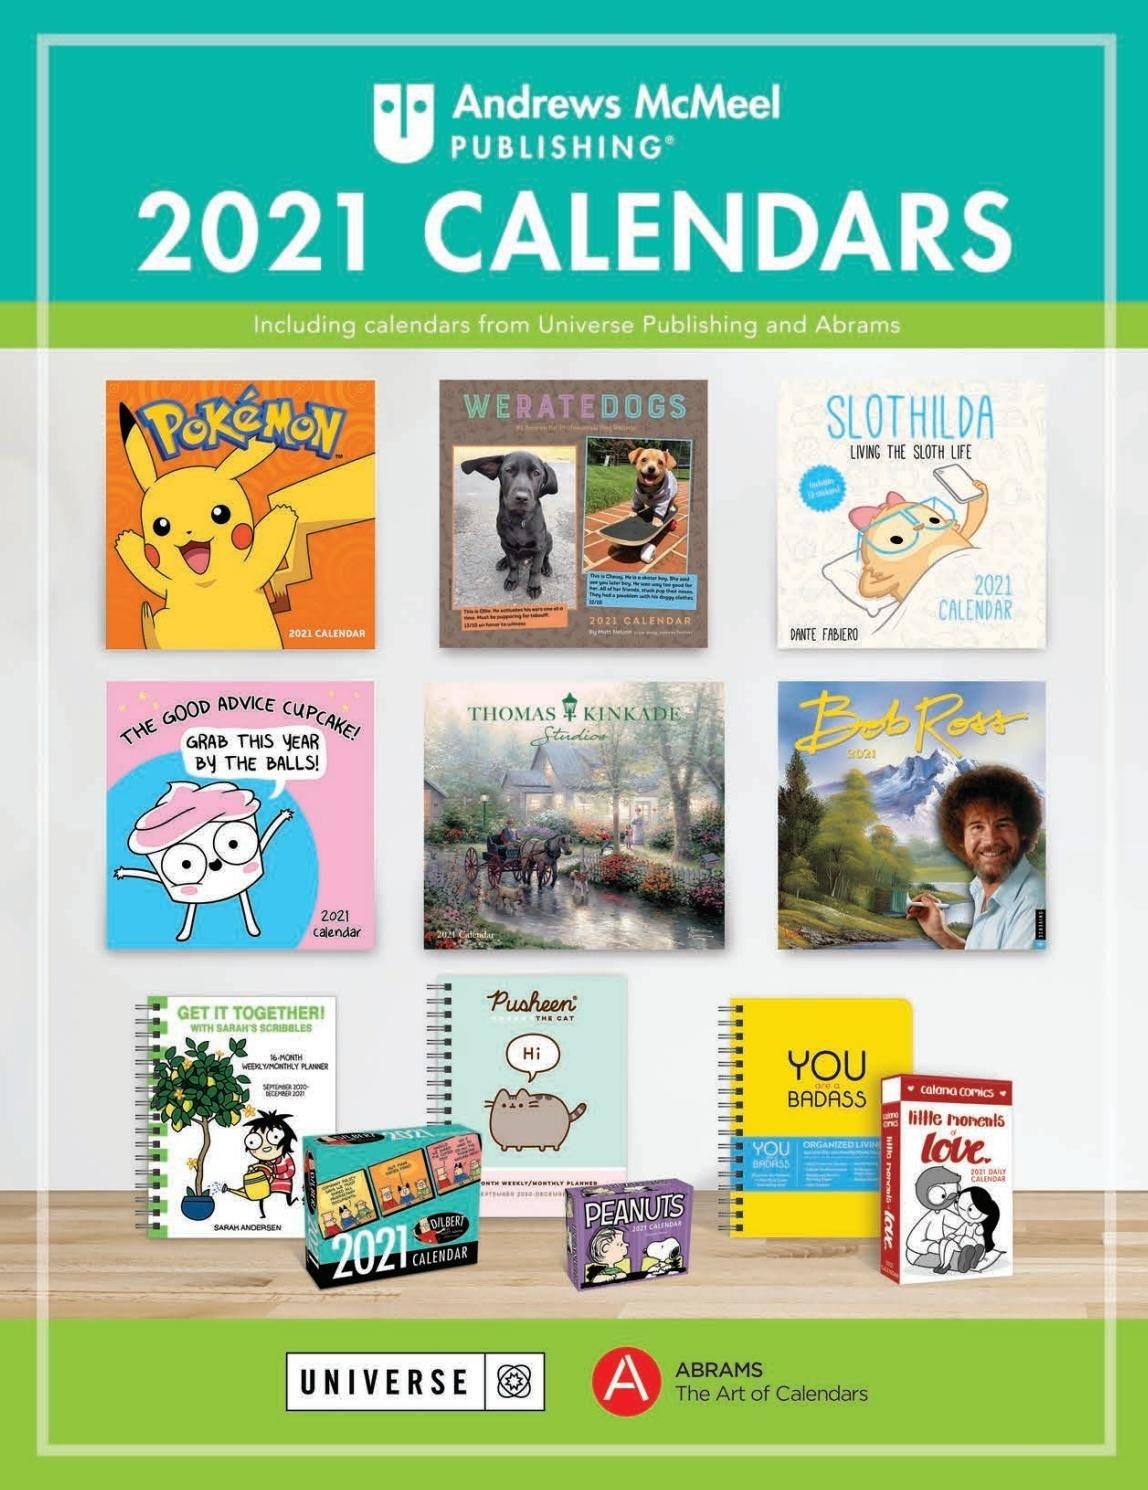 Andrews Mcmeel 2021 Calendar Catalog By Andrews Mcmeel